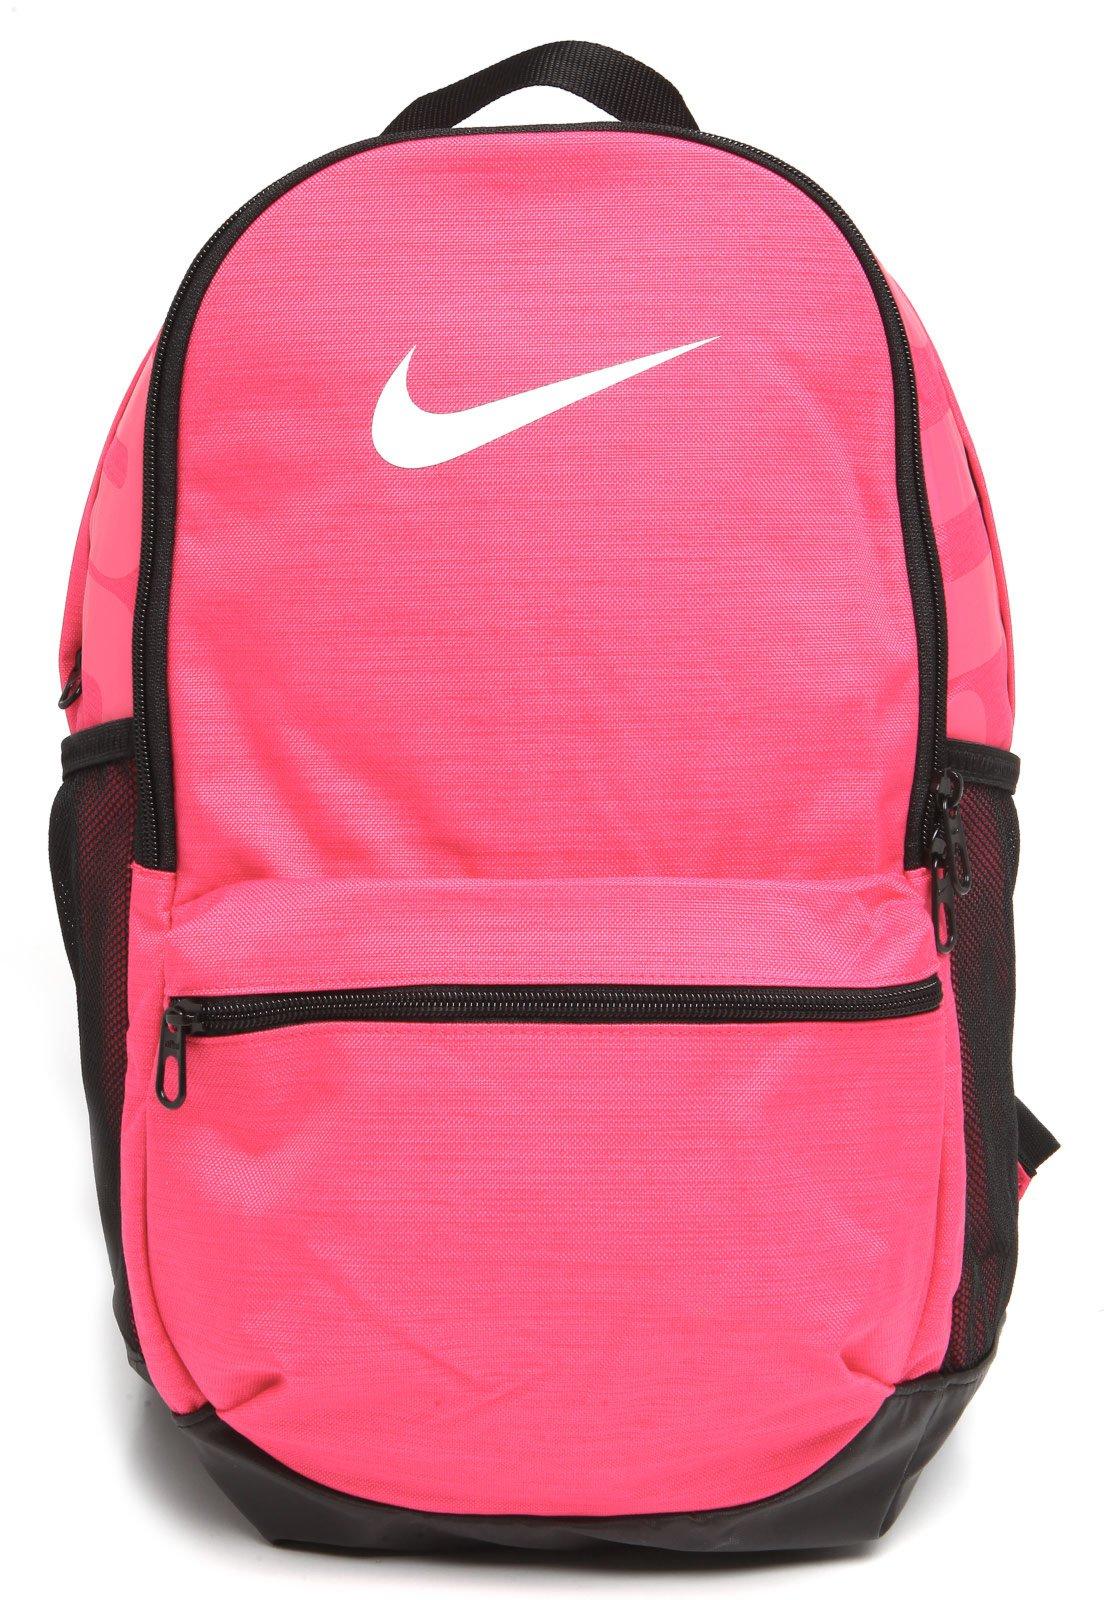 Investigación Juventud Percibir  Mochila Nike Brasilia Rosa/Preta - Compre Agora   Dafiti Brasil